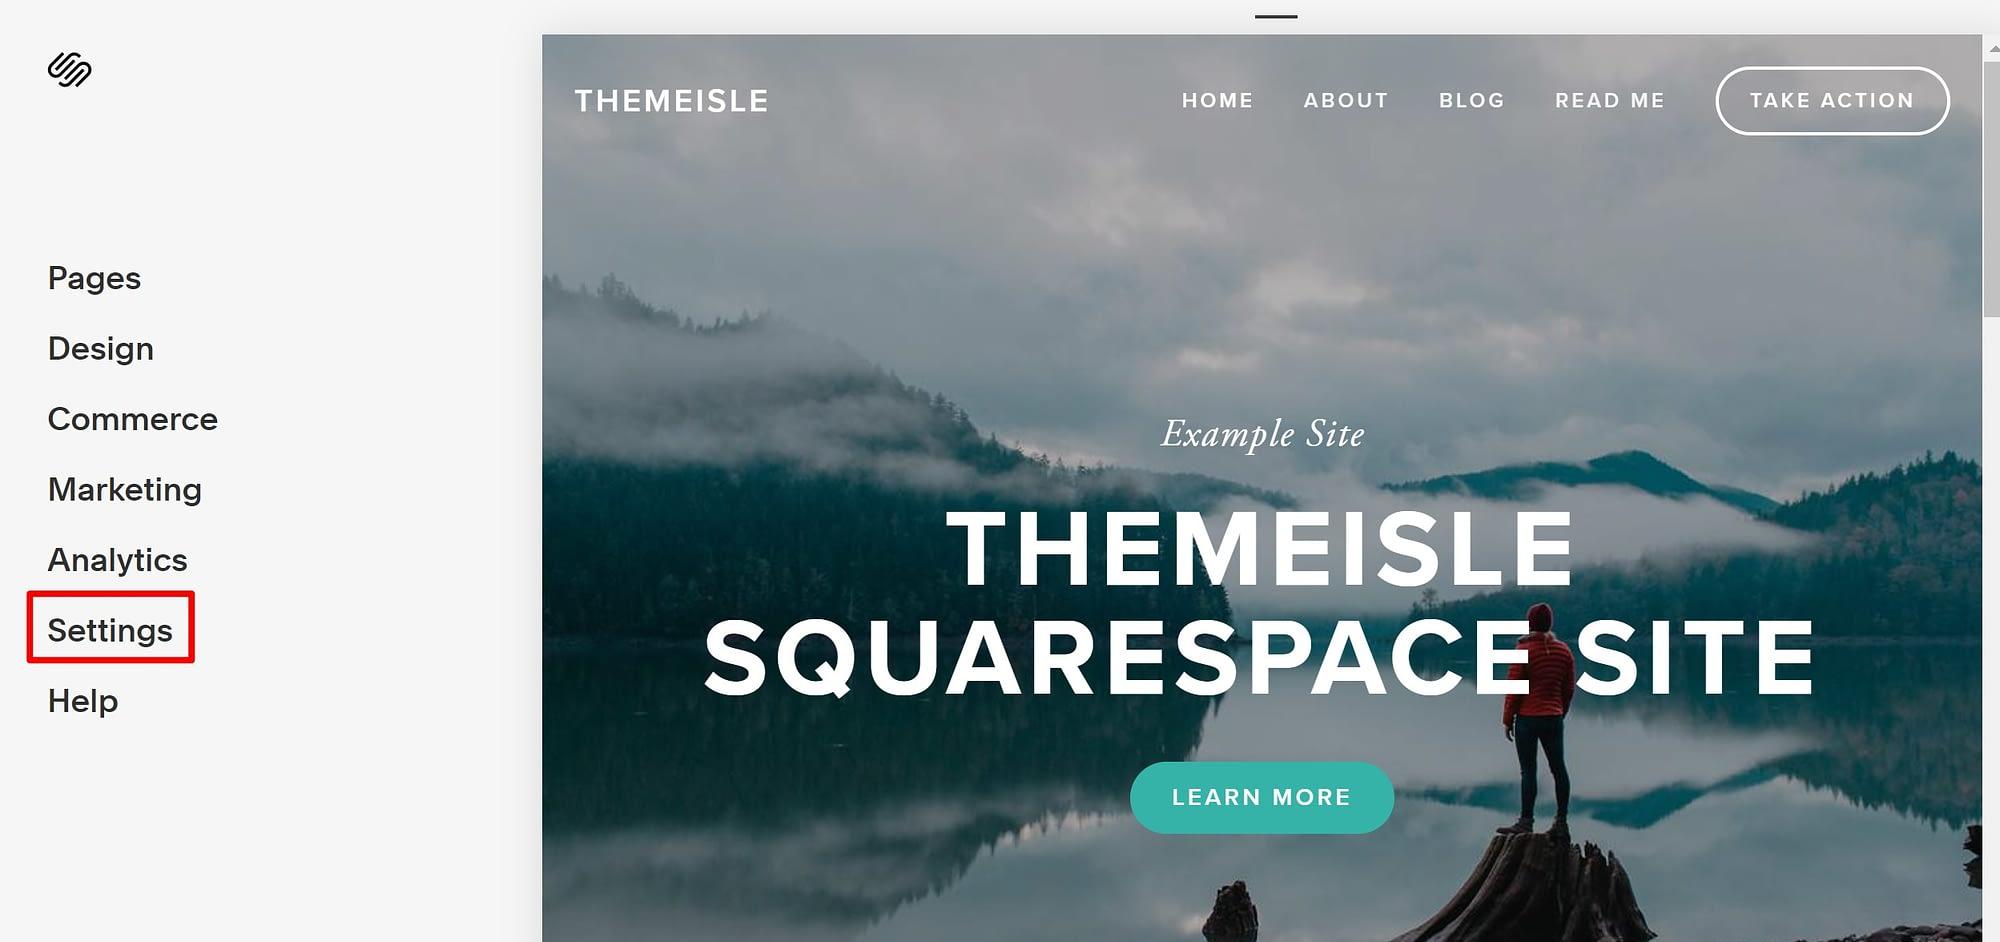 Squarespace settings